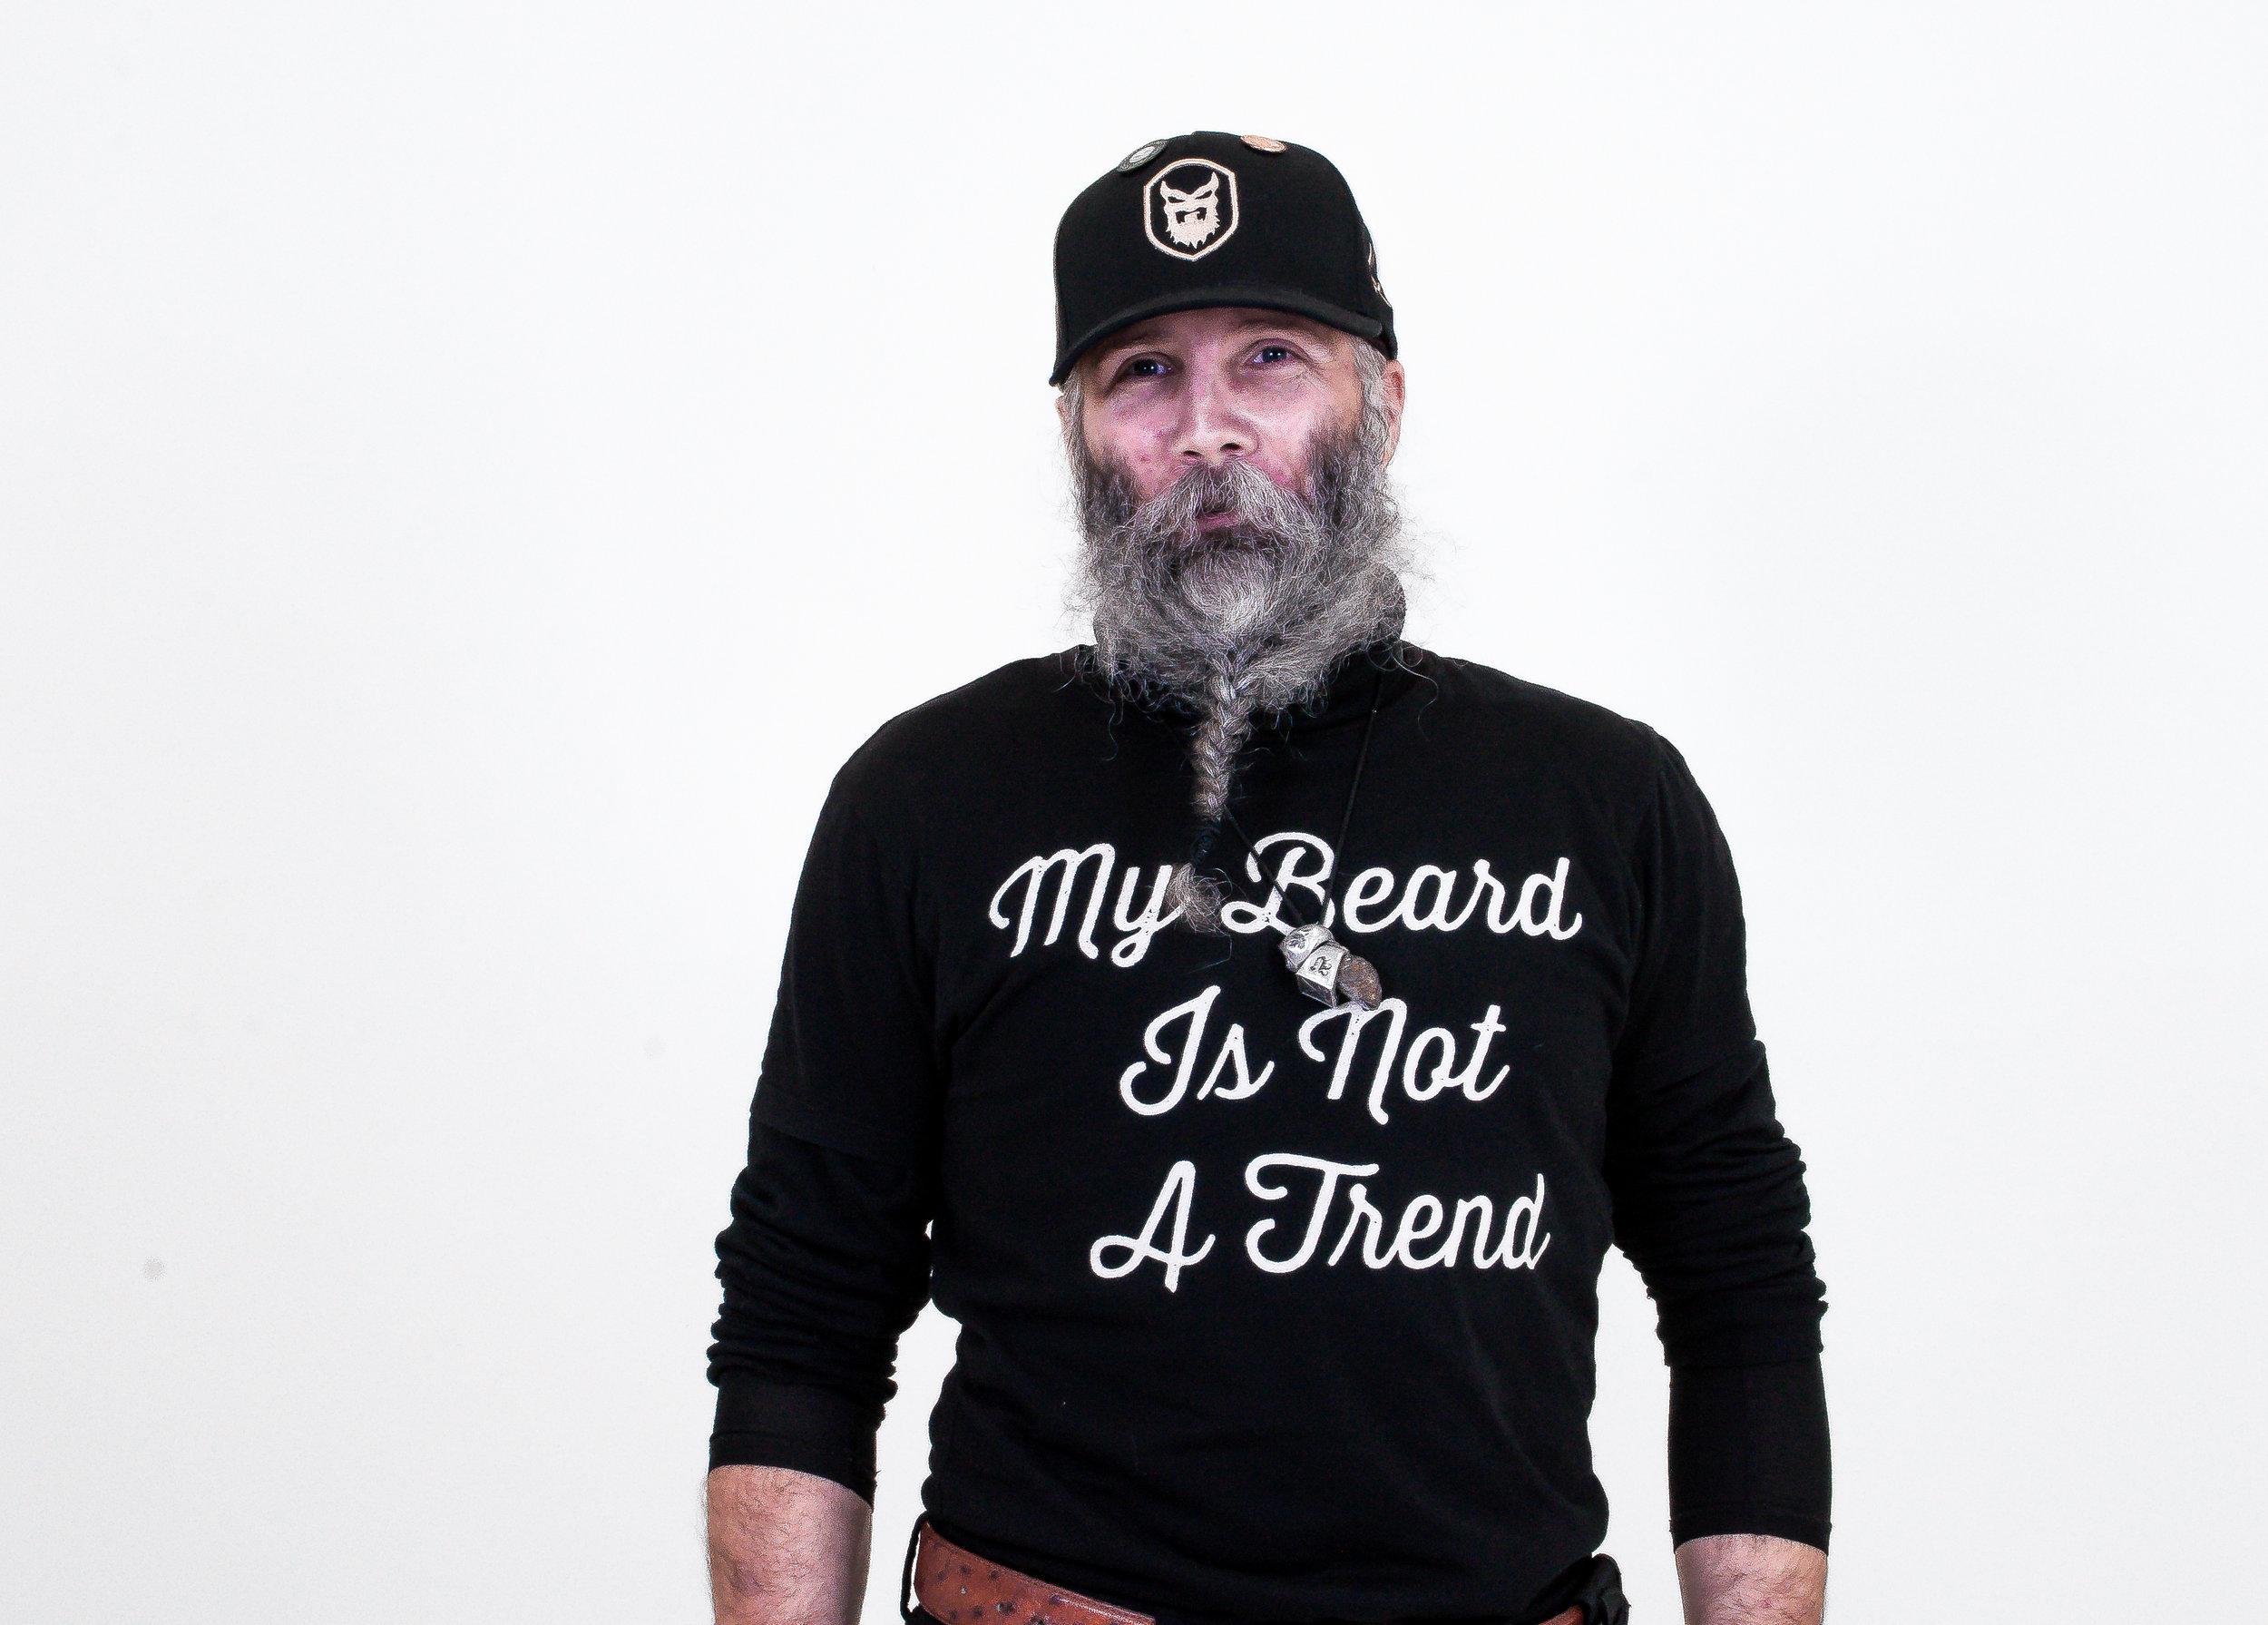 """A beard isn't a fad. It's a lifestyle."" - -Chris Edge, Founder of Urban Beard"